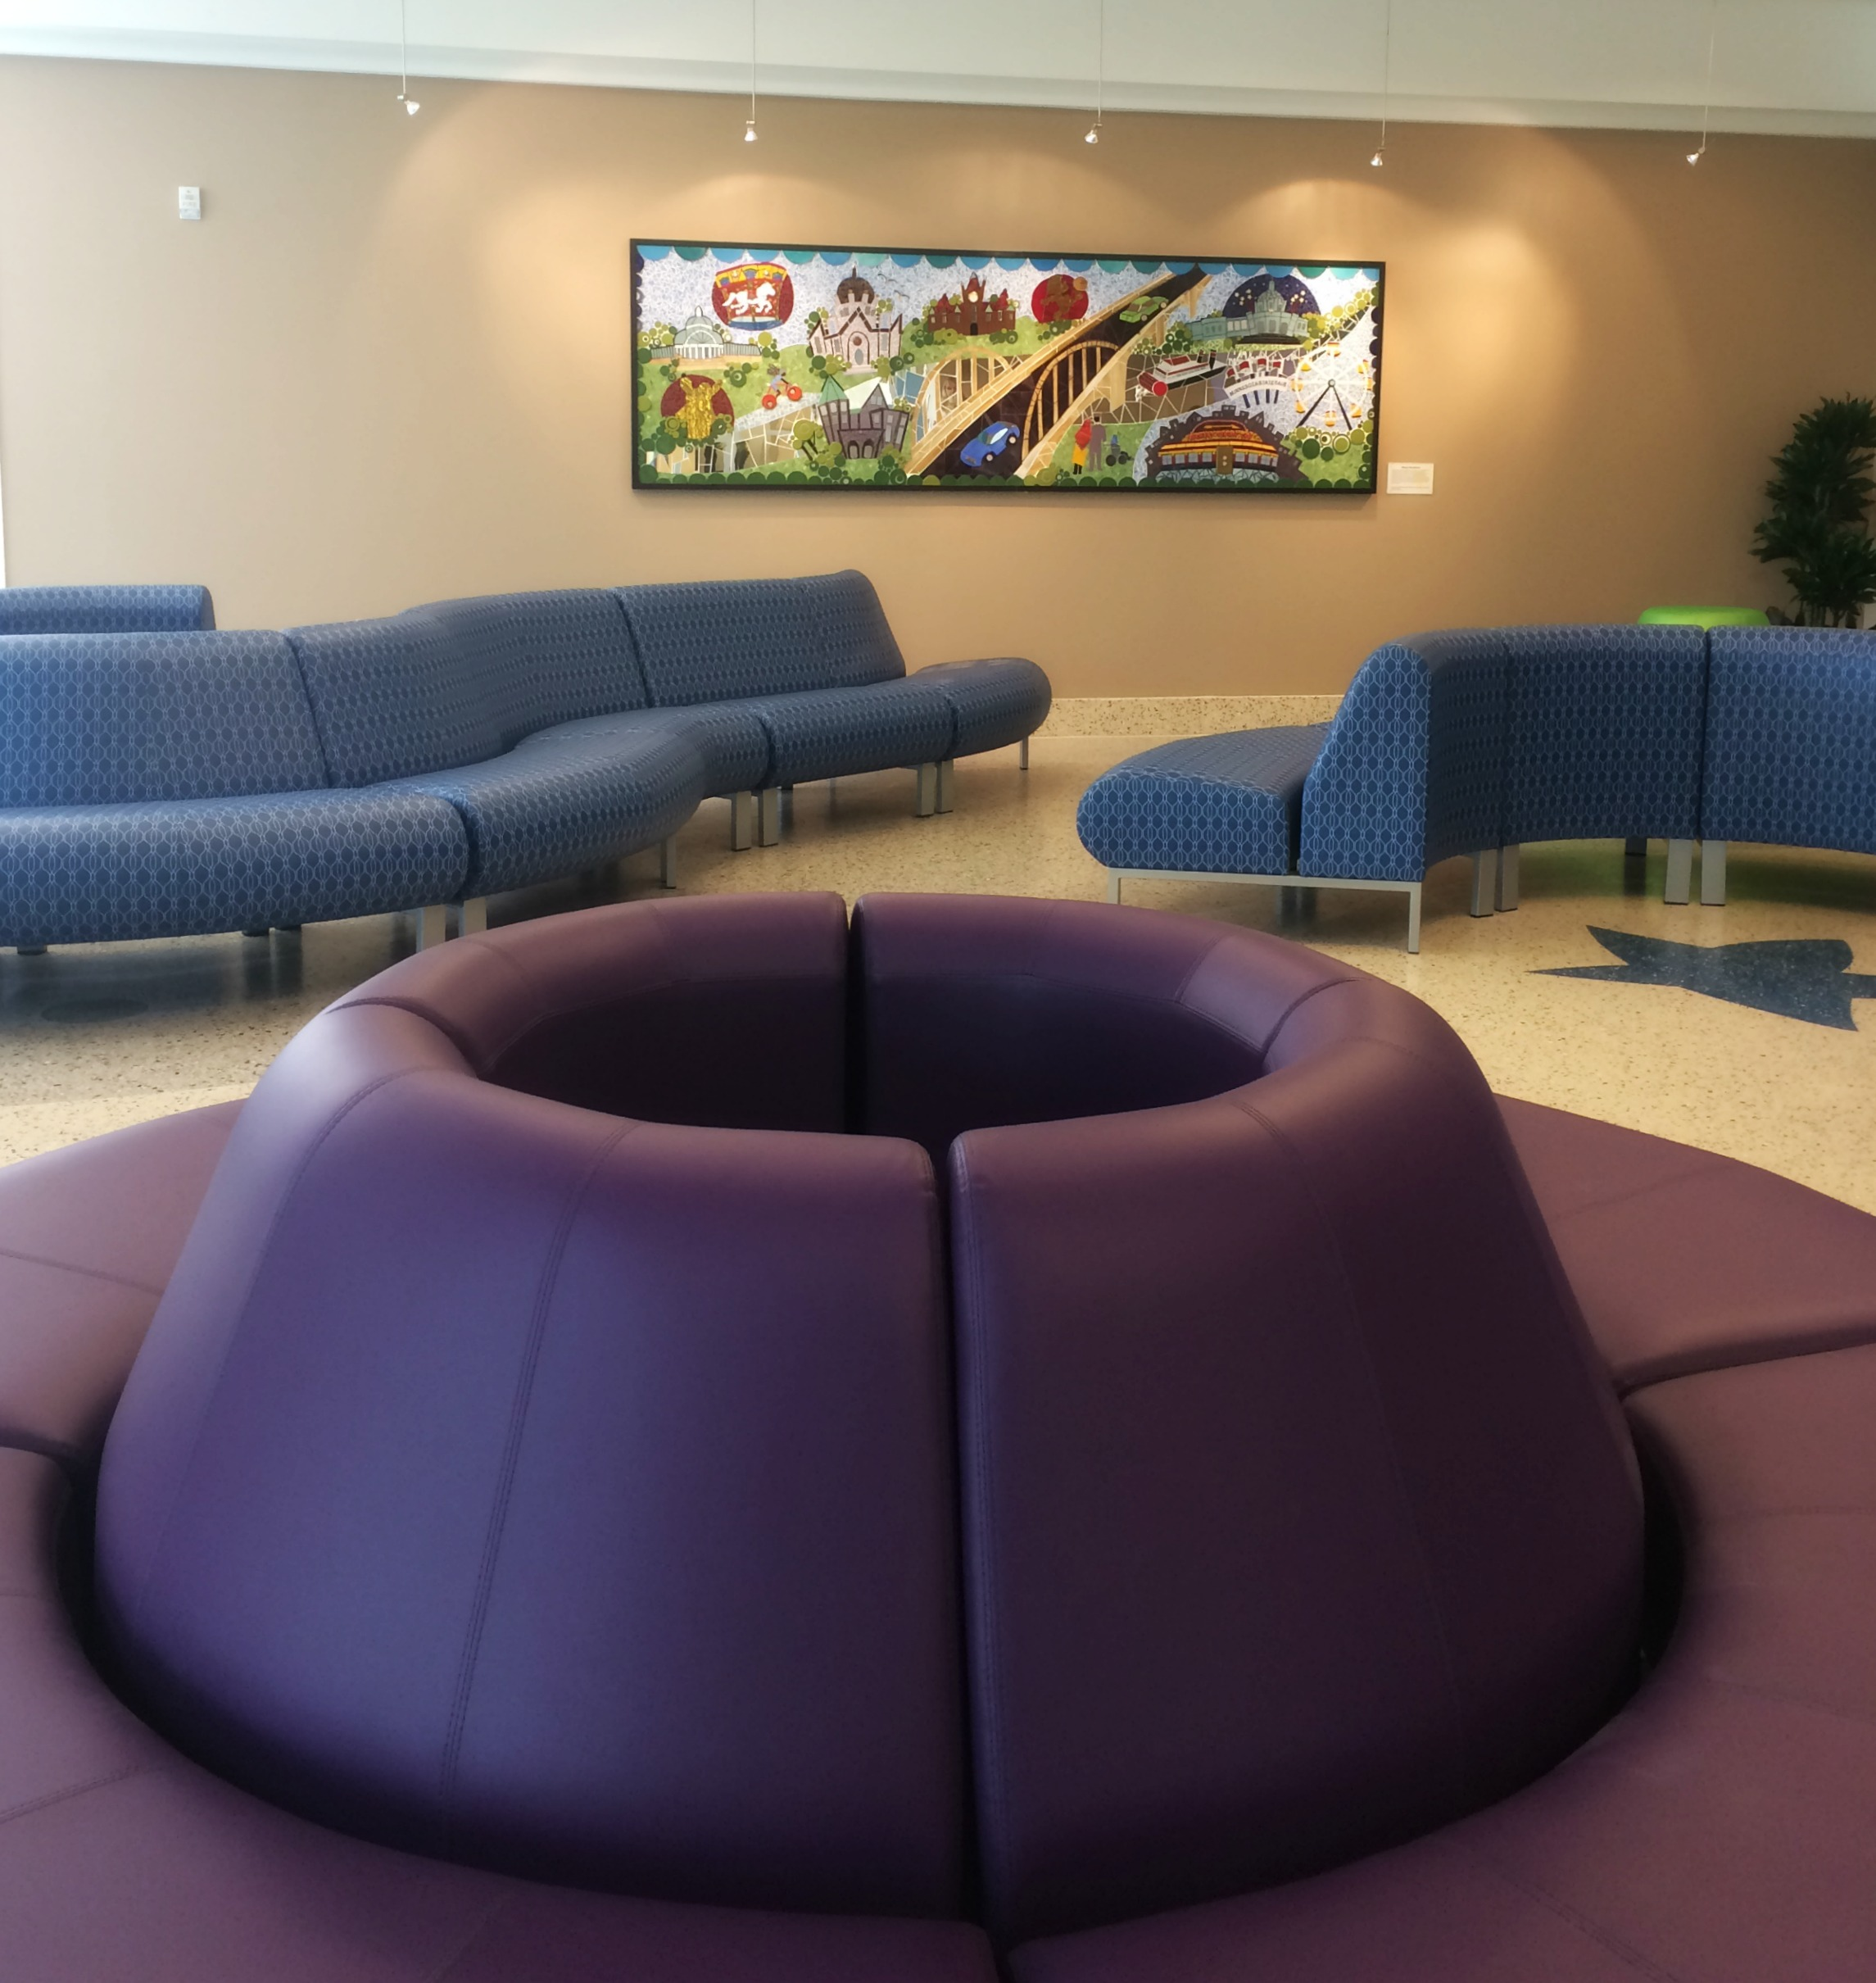 Radius Seating by Davis Furniture, at Children's Hospital and Clinics of Minnesota,